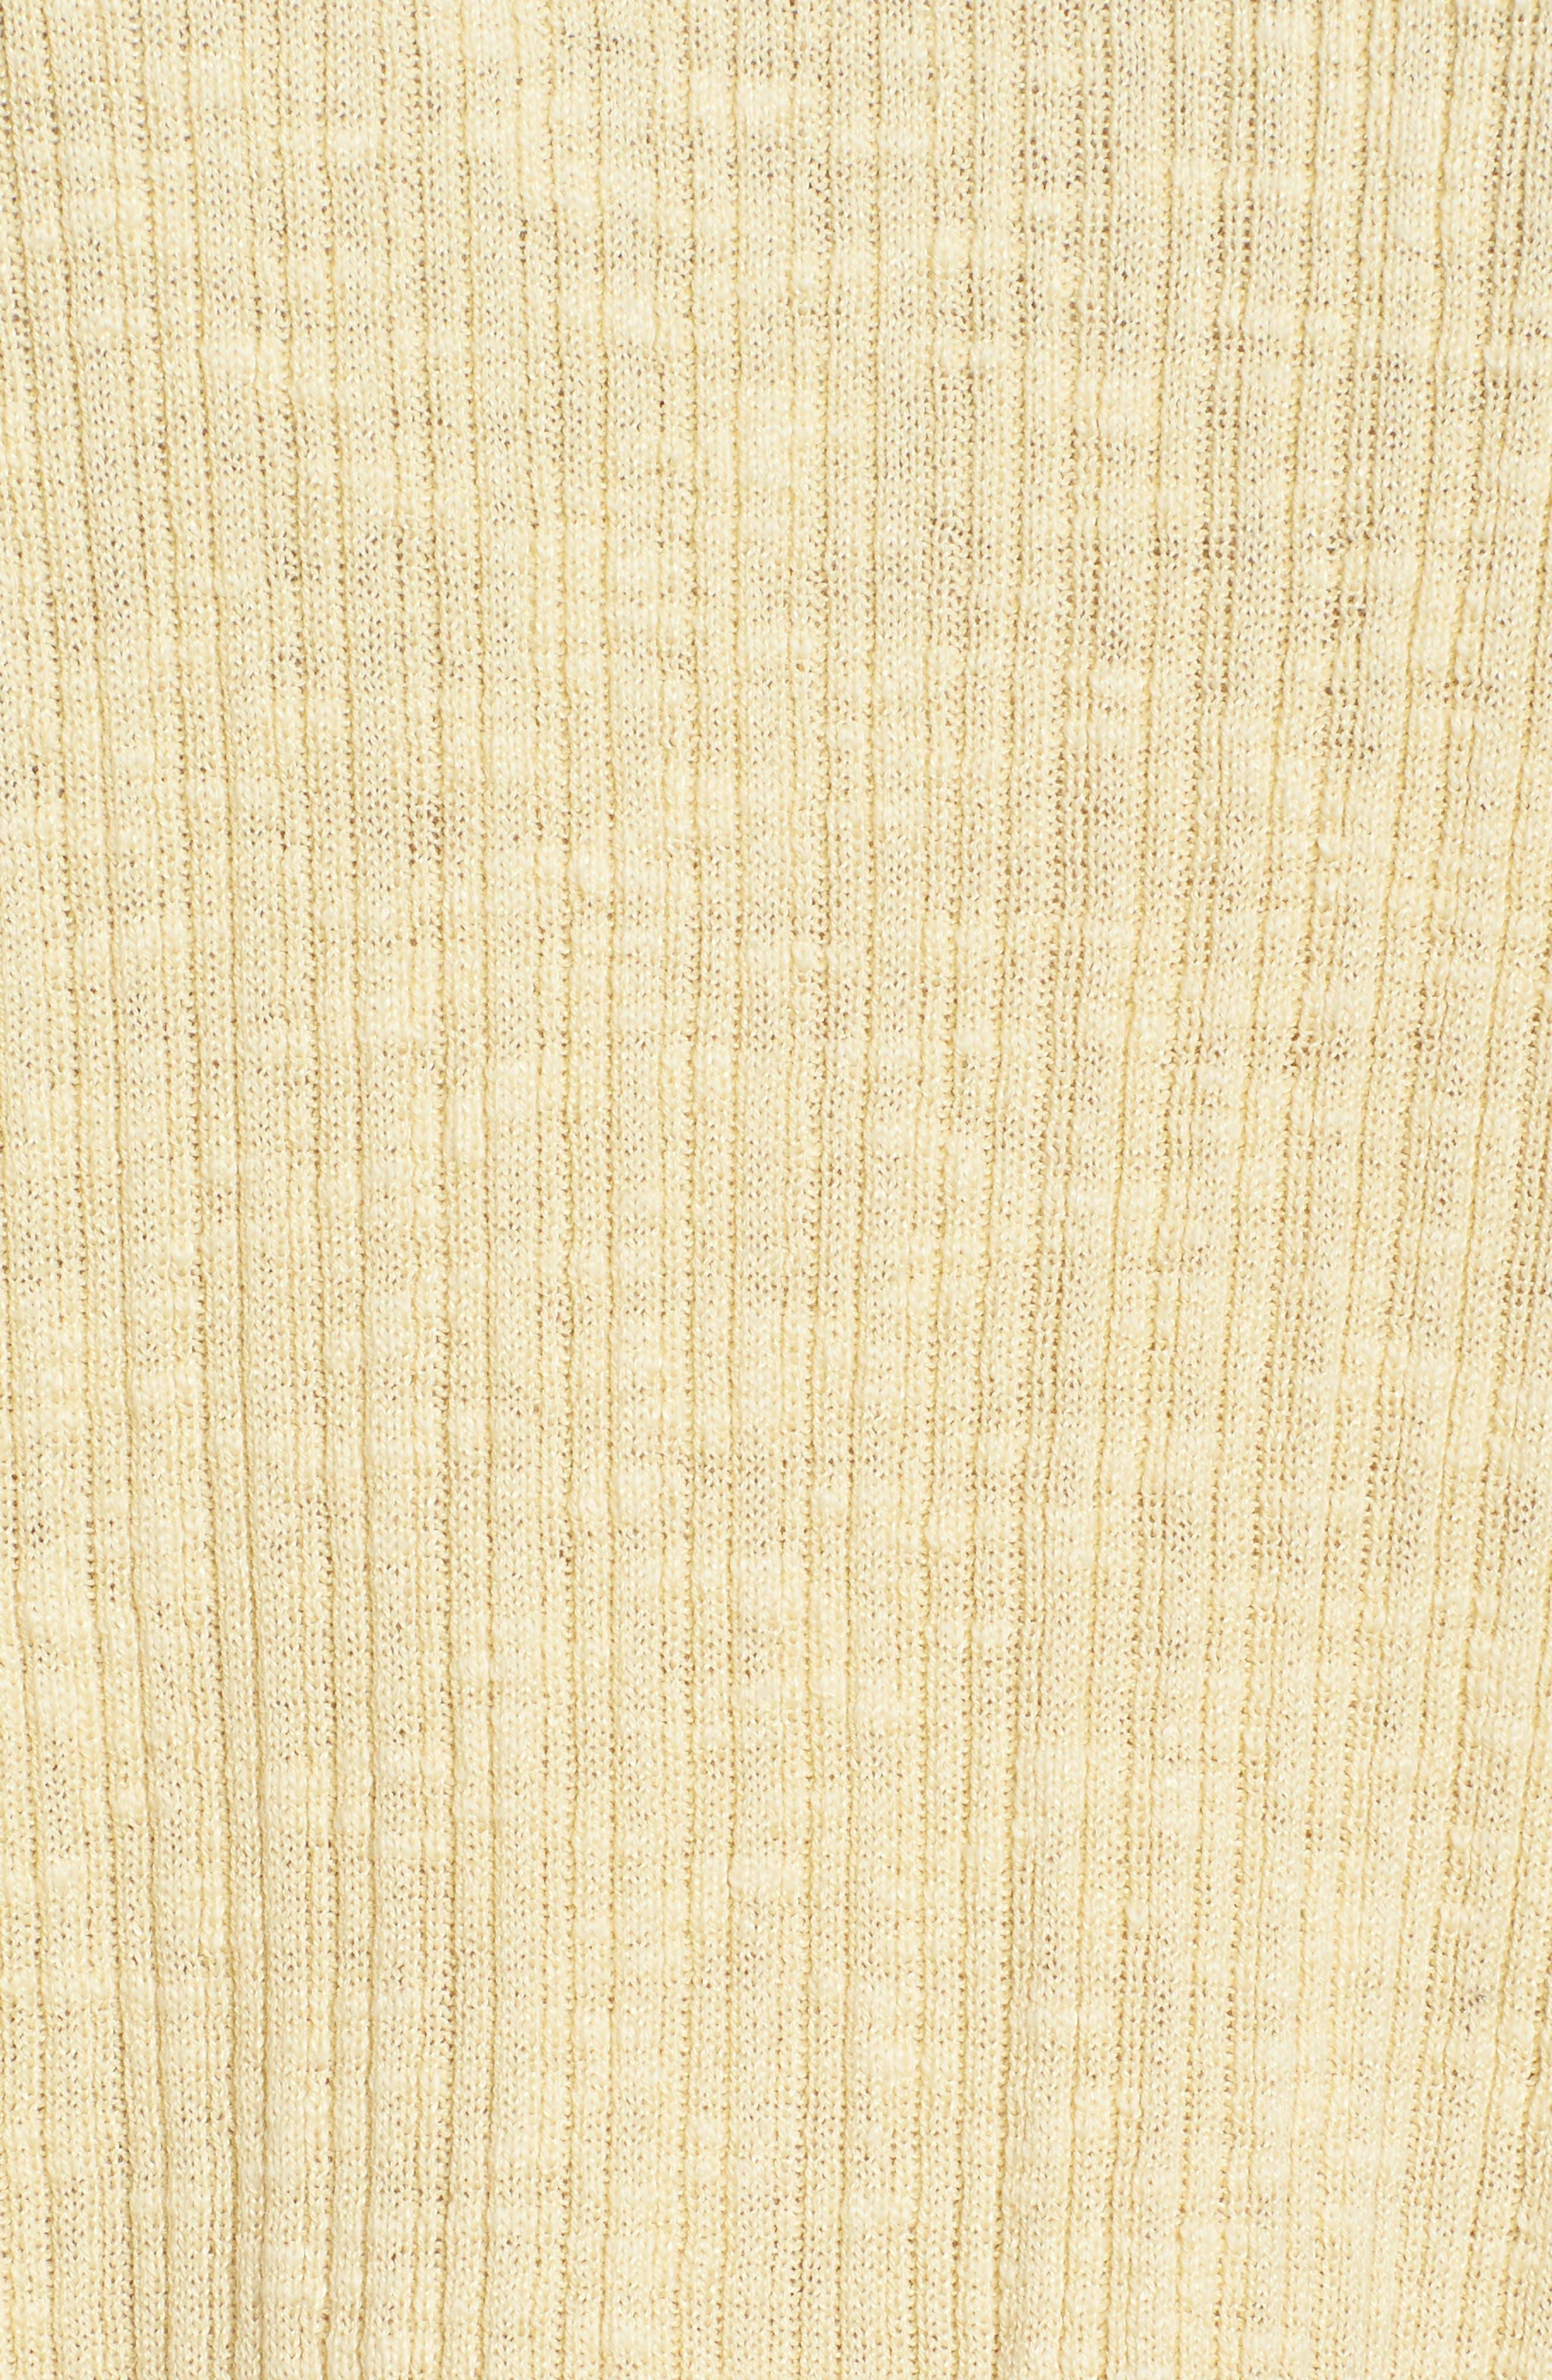 Organic Linen & Cotton Crewneck Sweater,                             Alternate thumbnail 22, color,